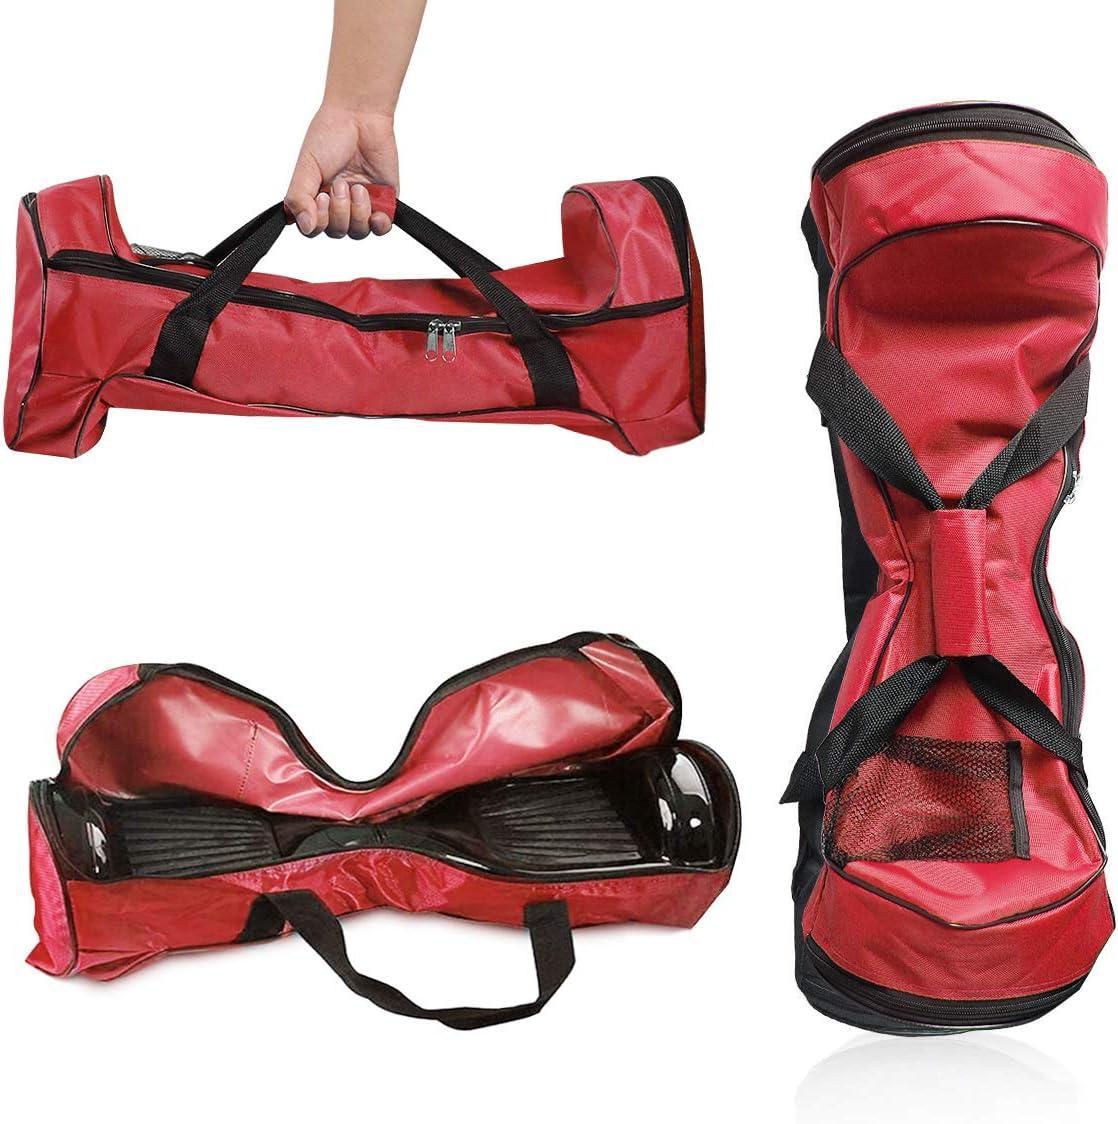 GameXcel hoverboard bag